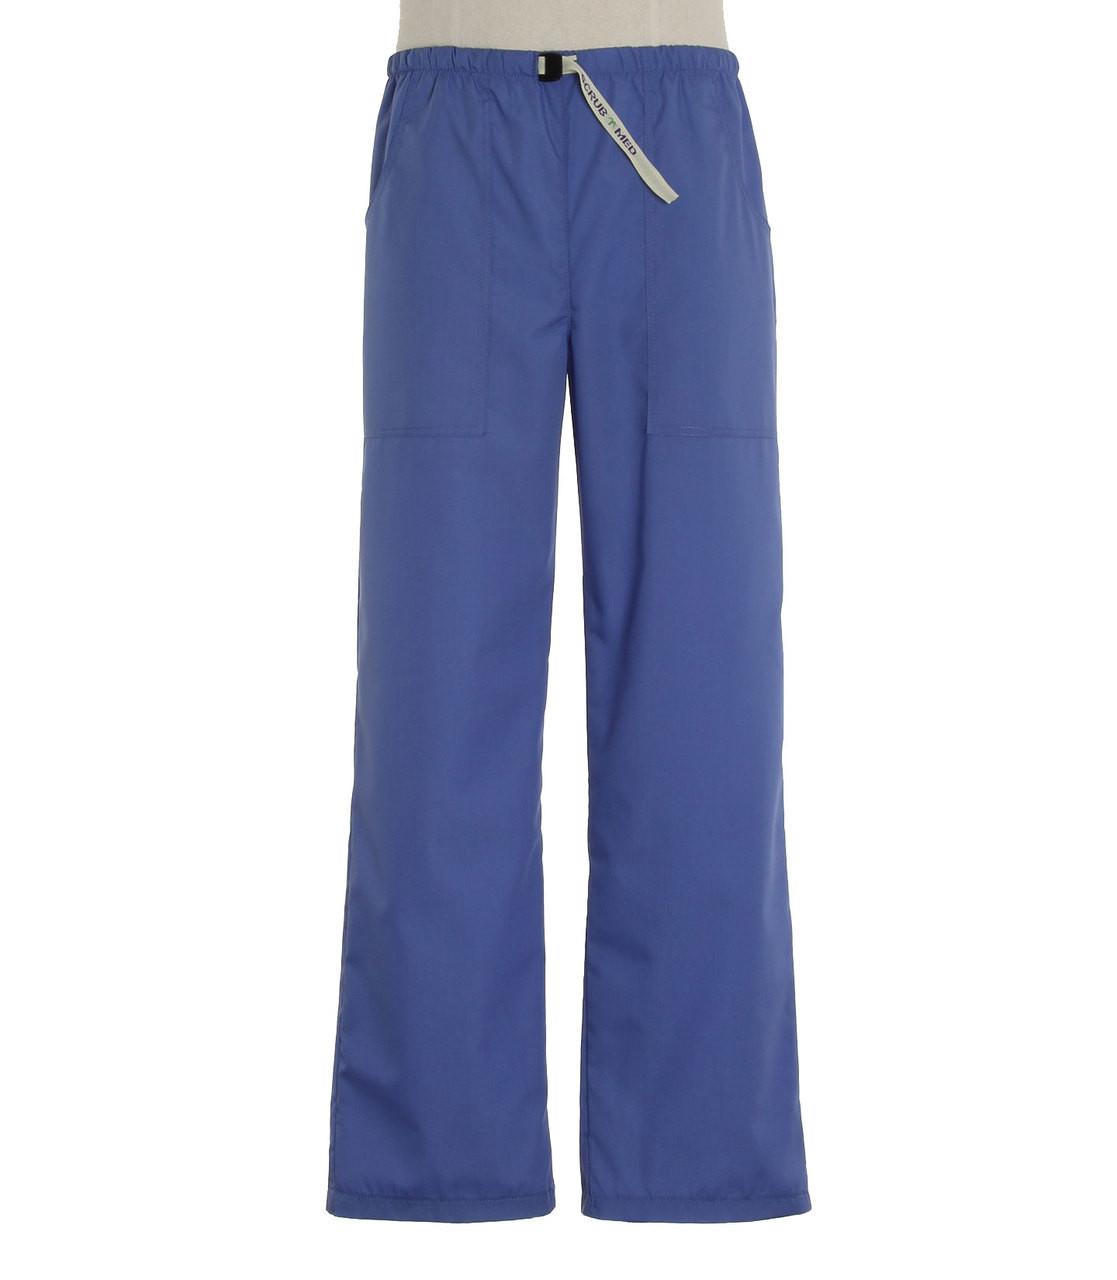 ad442390875 Scrub Med Mens Belted Scrub Pants Hyacinth (ScrubLite) - Scrub Med